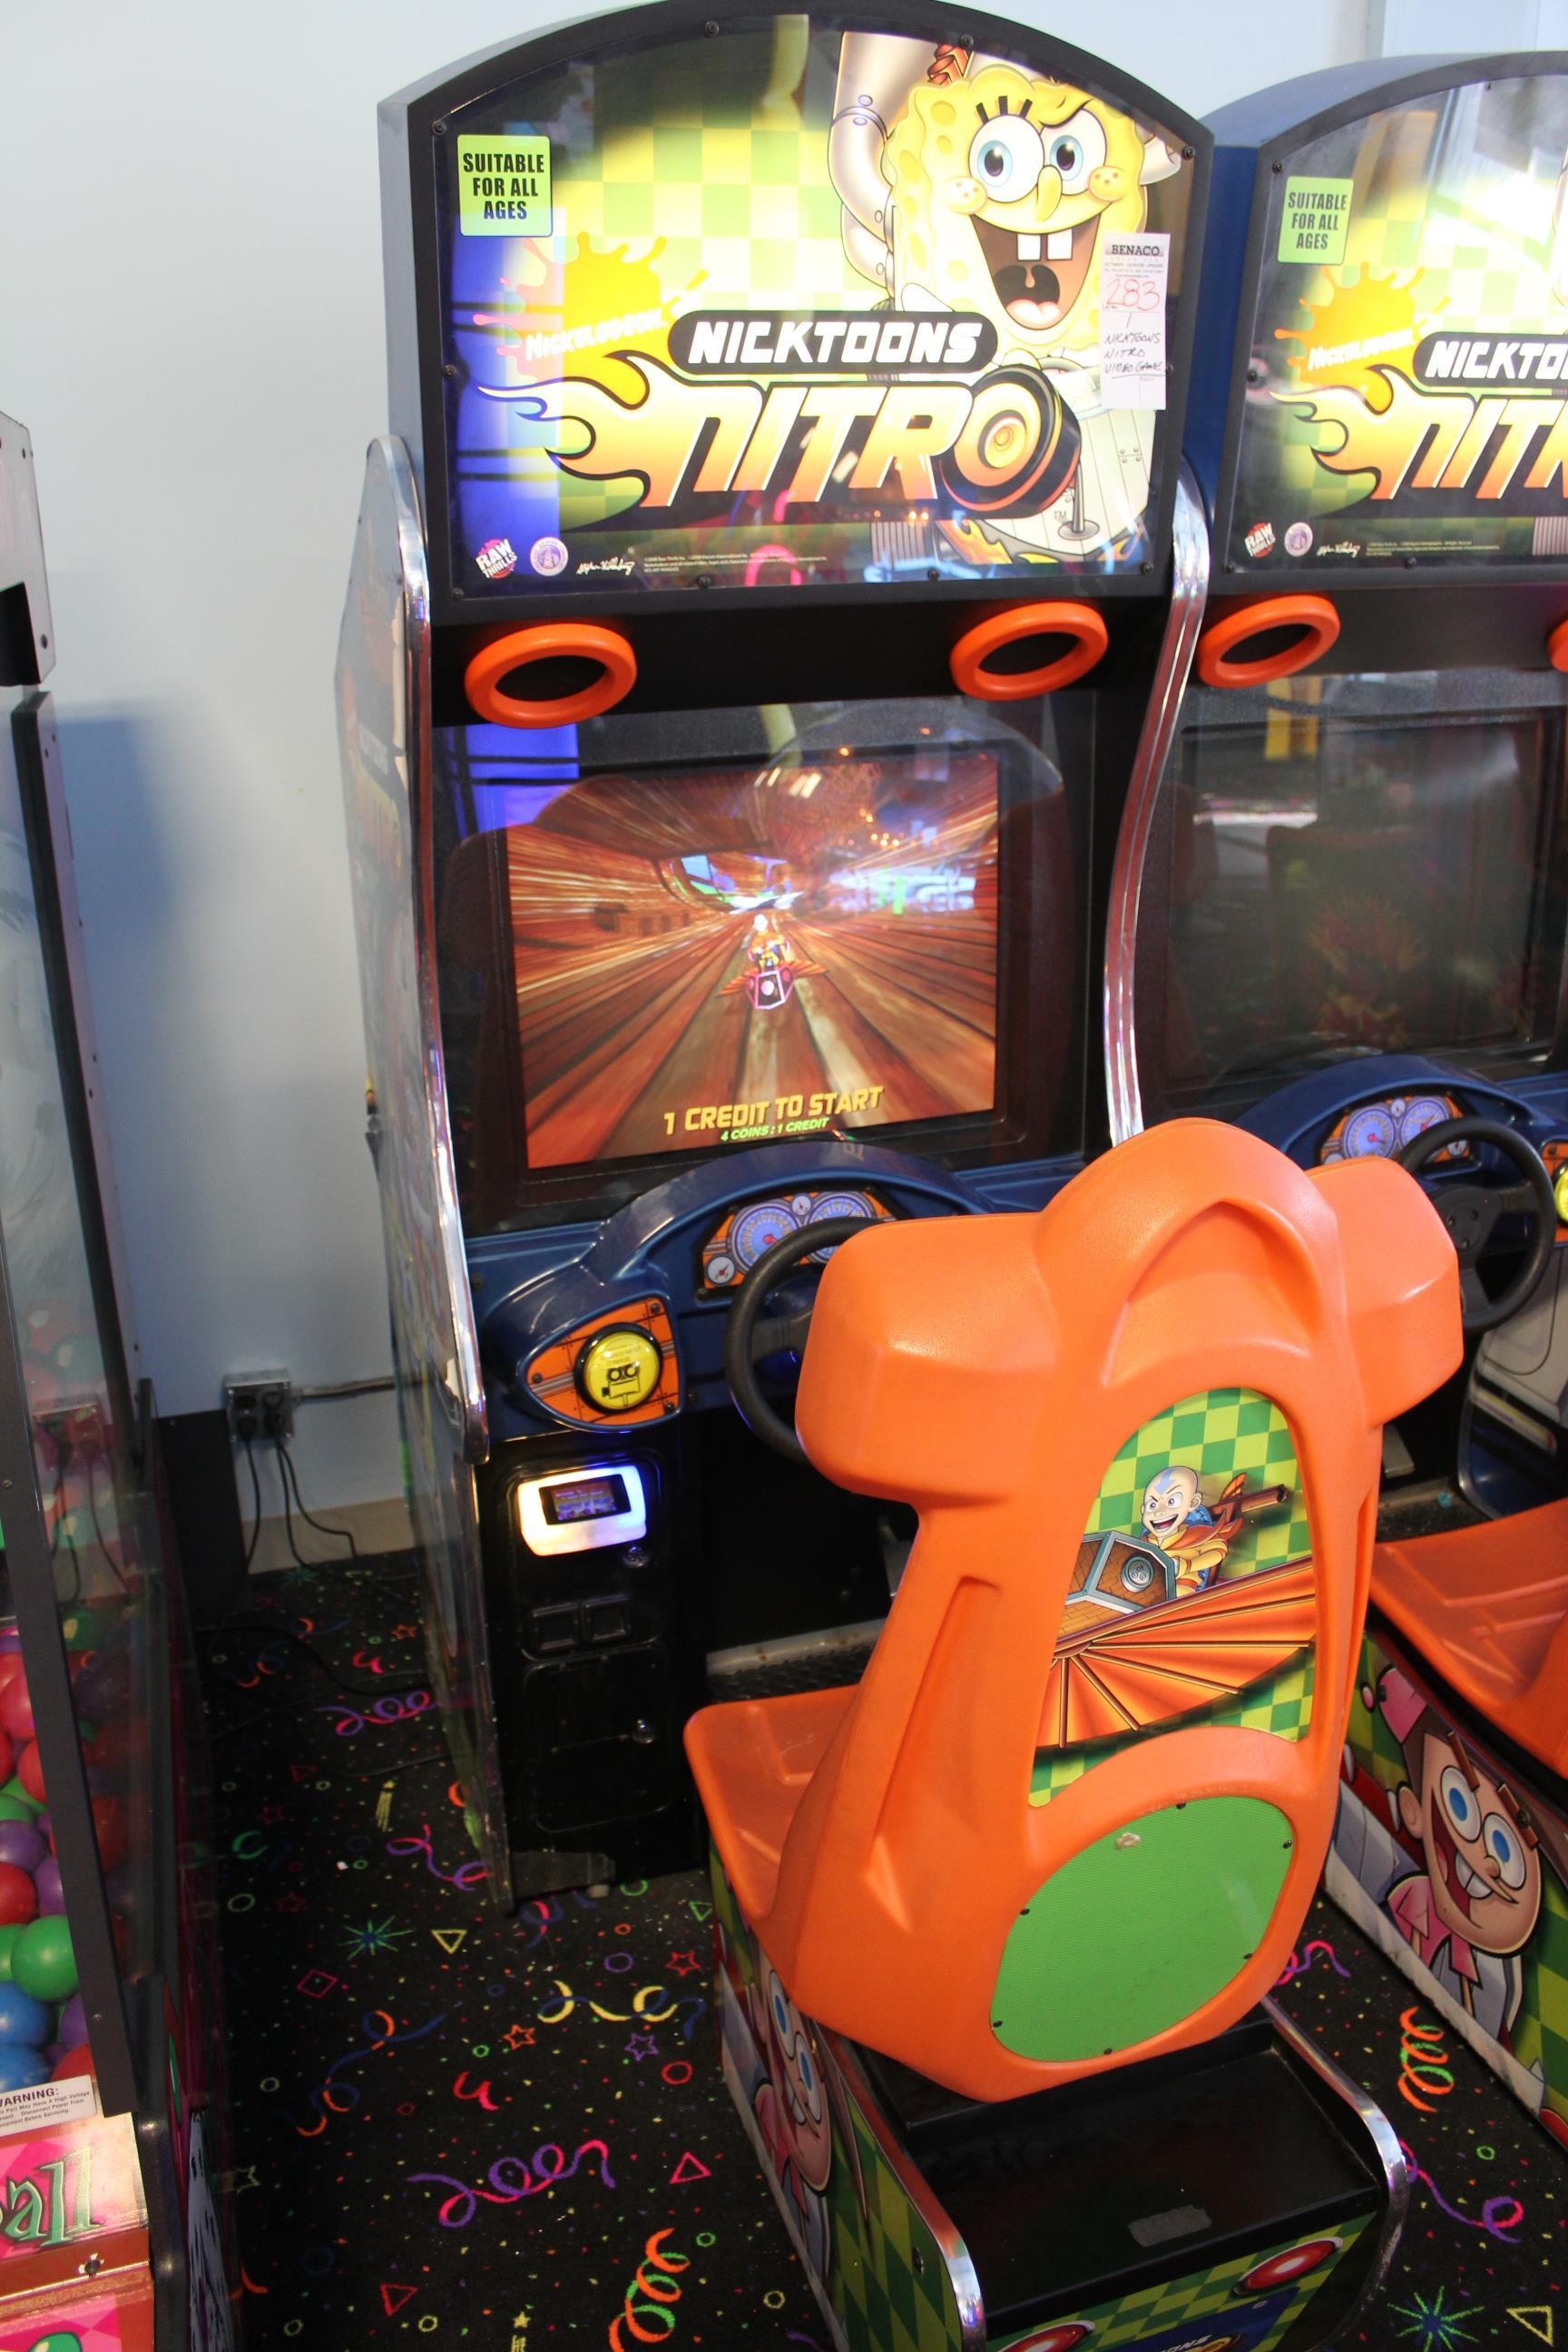 Lot 282 - 1X, NICKTOONS NITRO VIDEO GAME